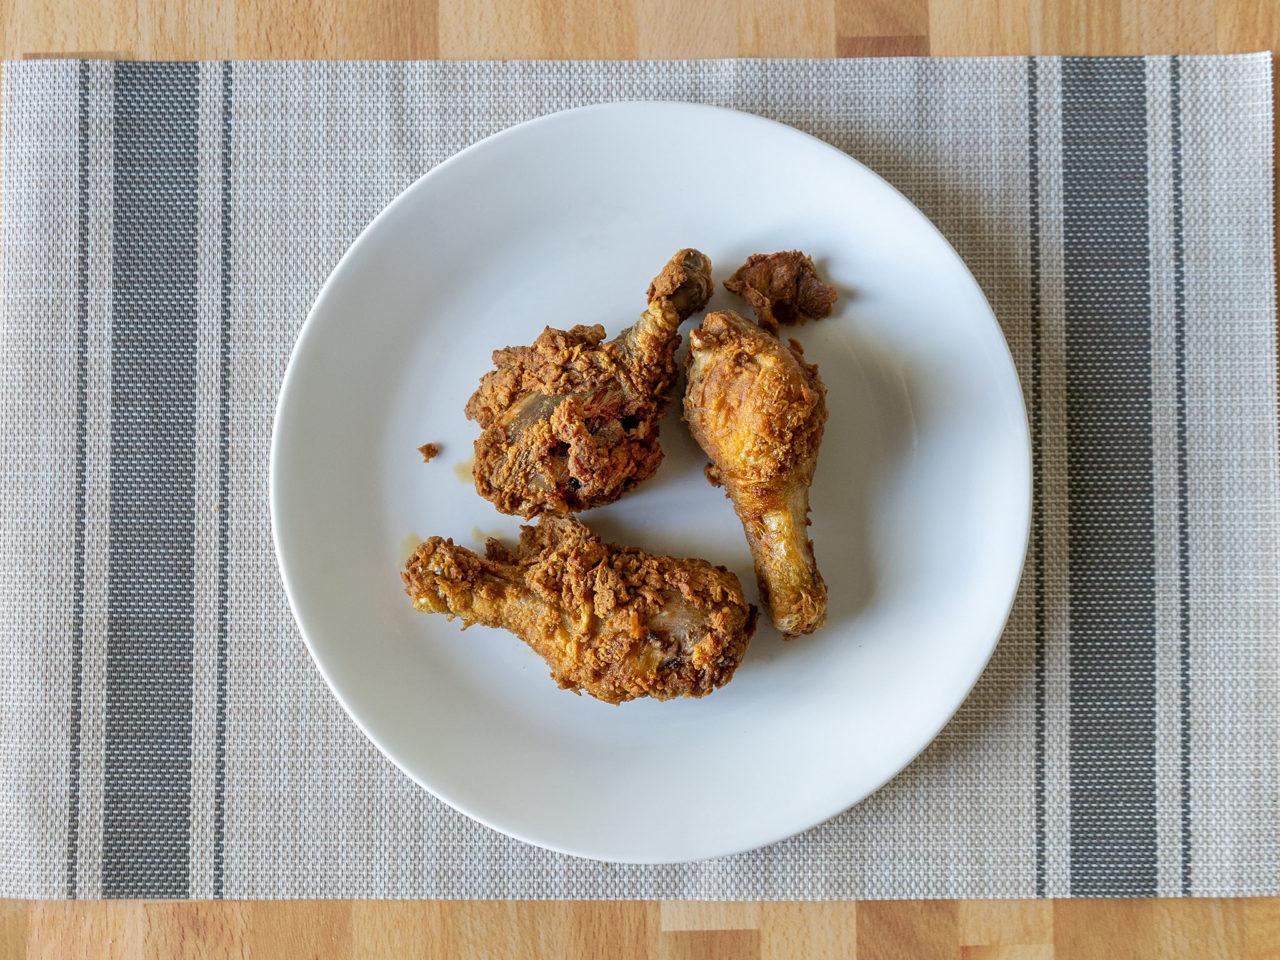 Reheated fried chicken using an air fryer